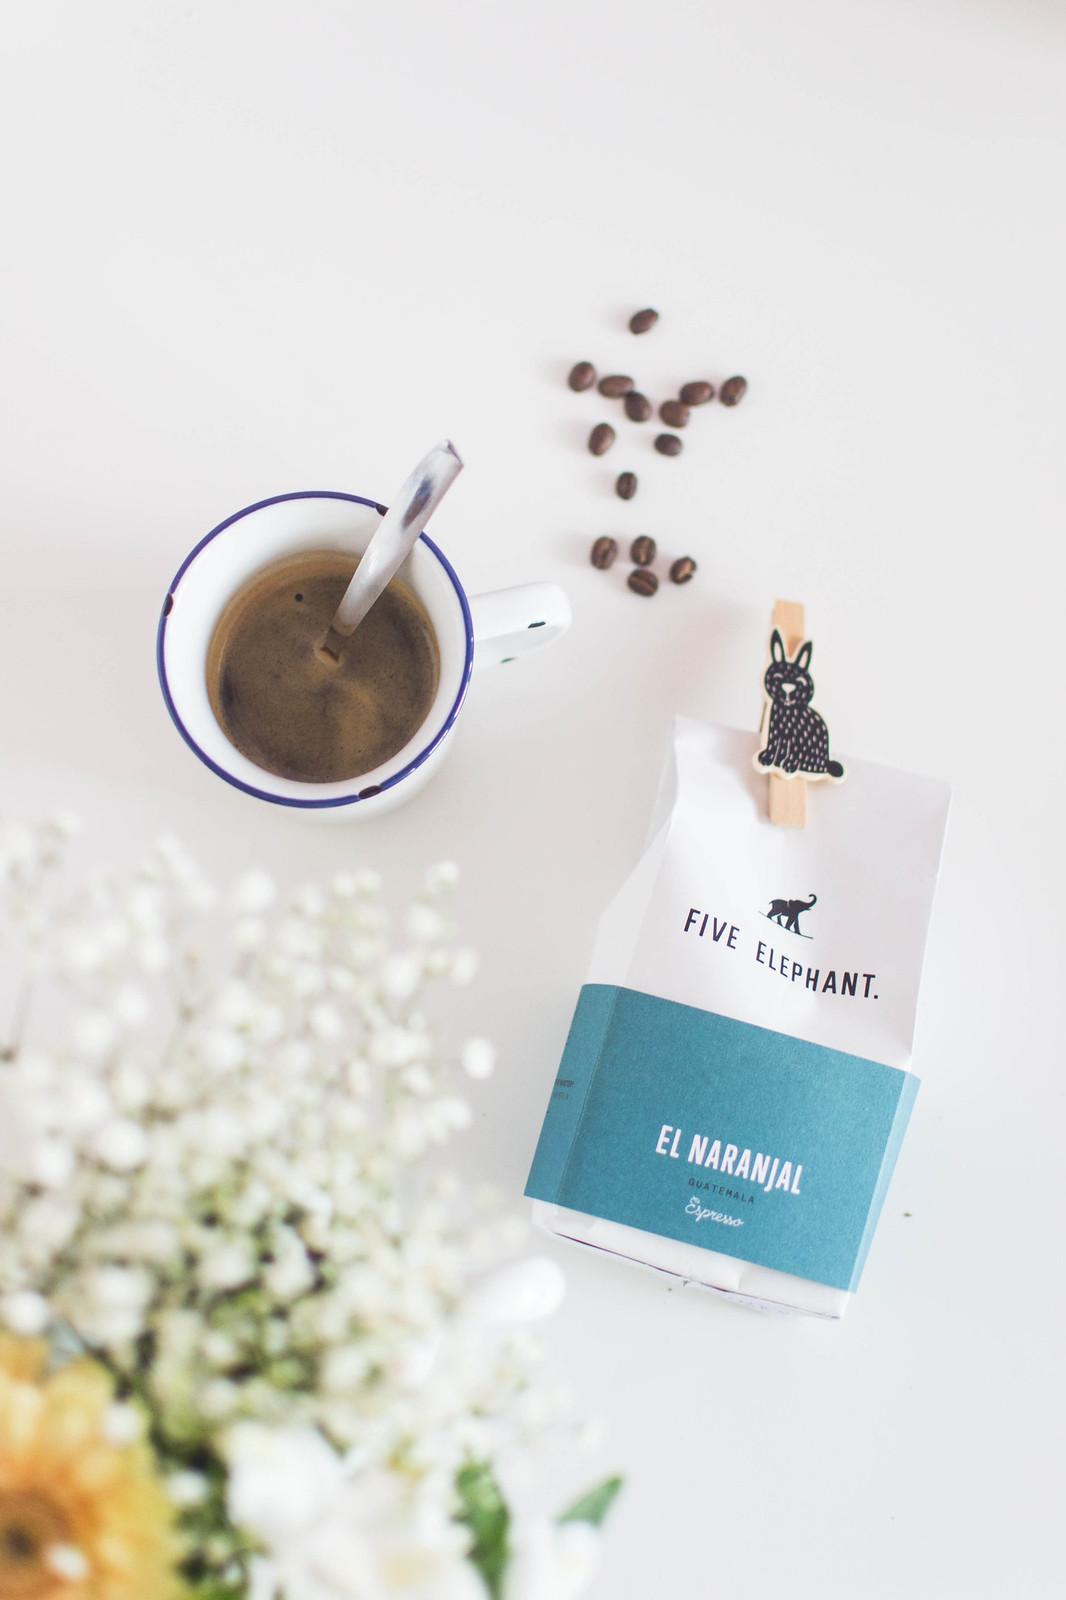 Five Elephant espresso coffee